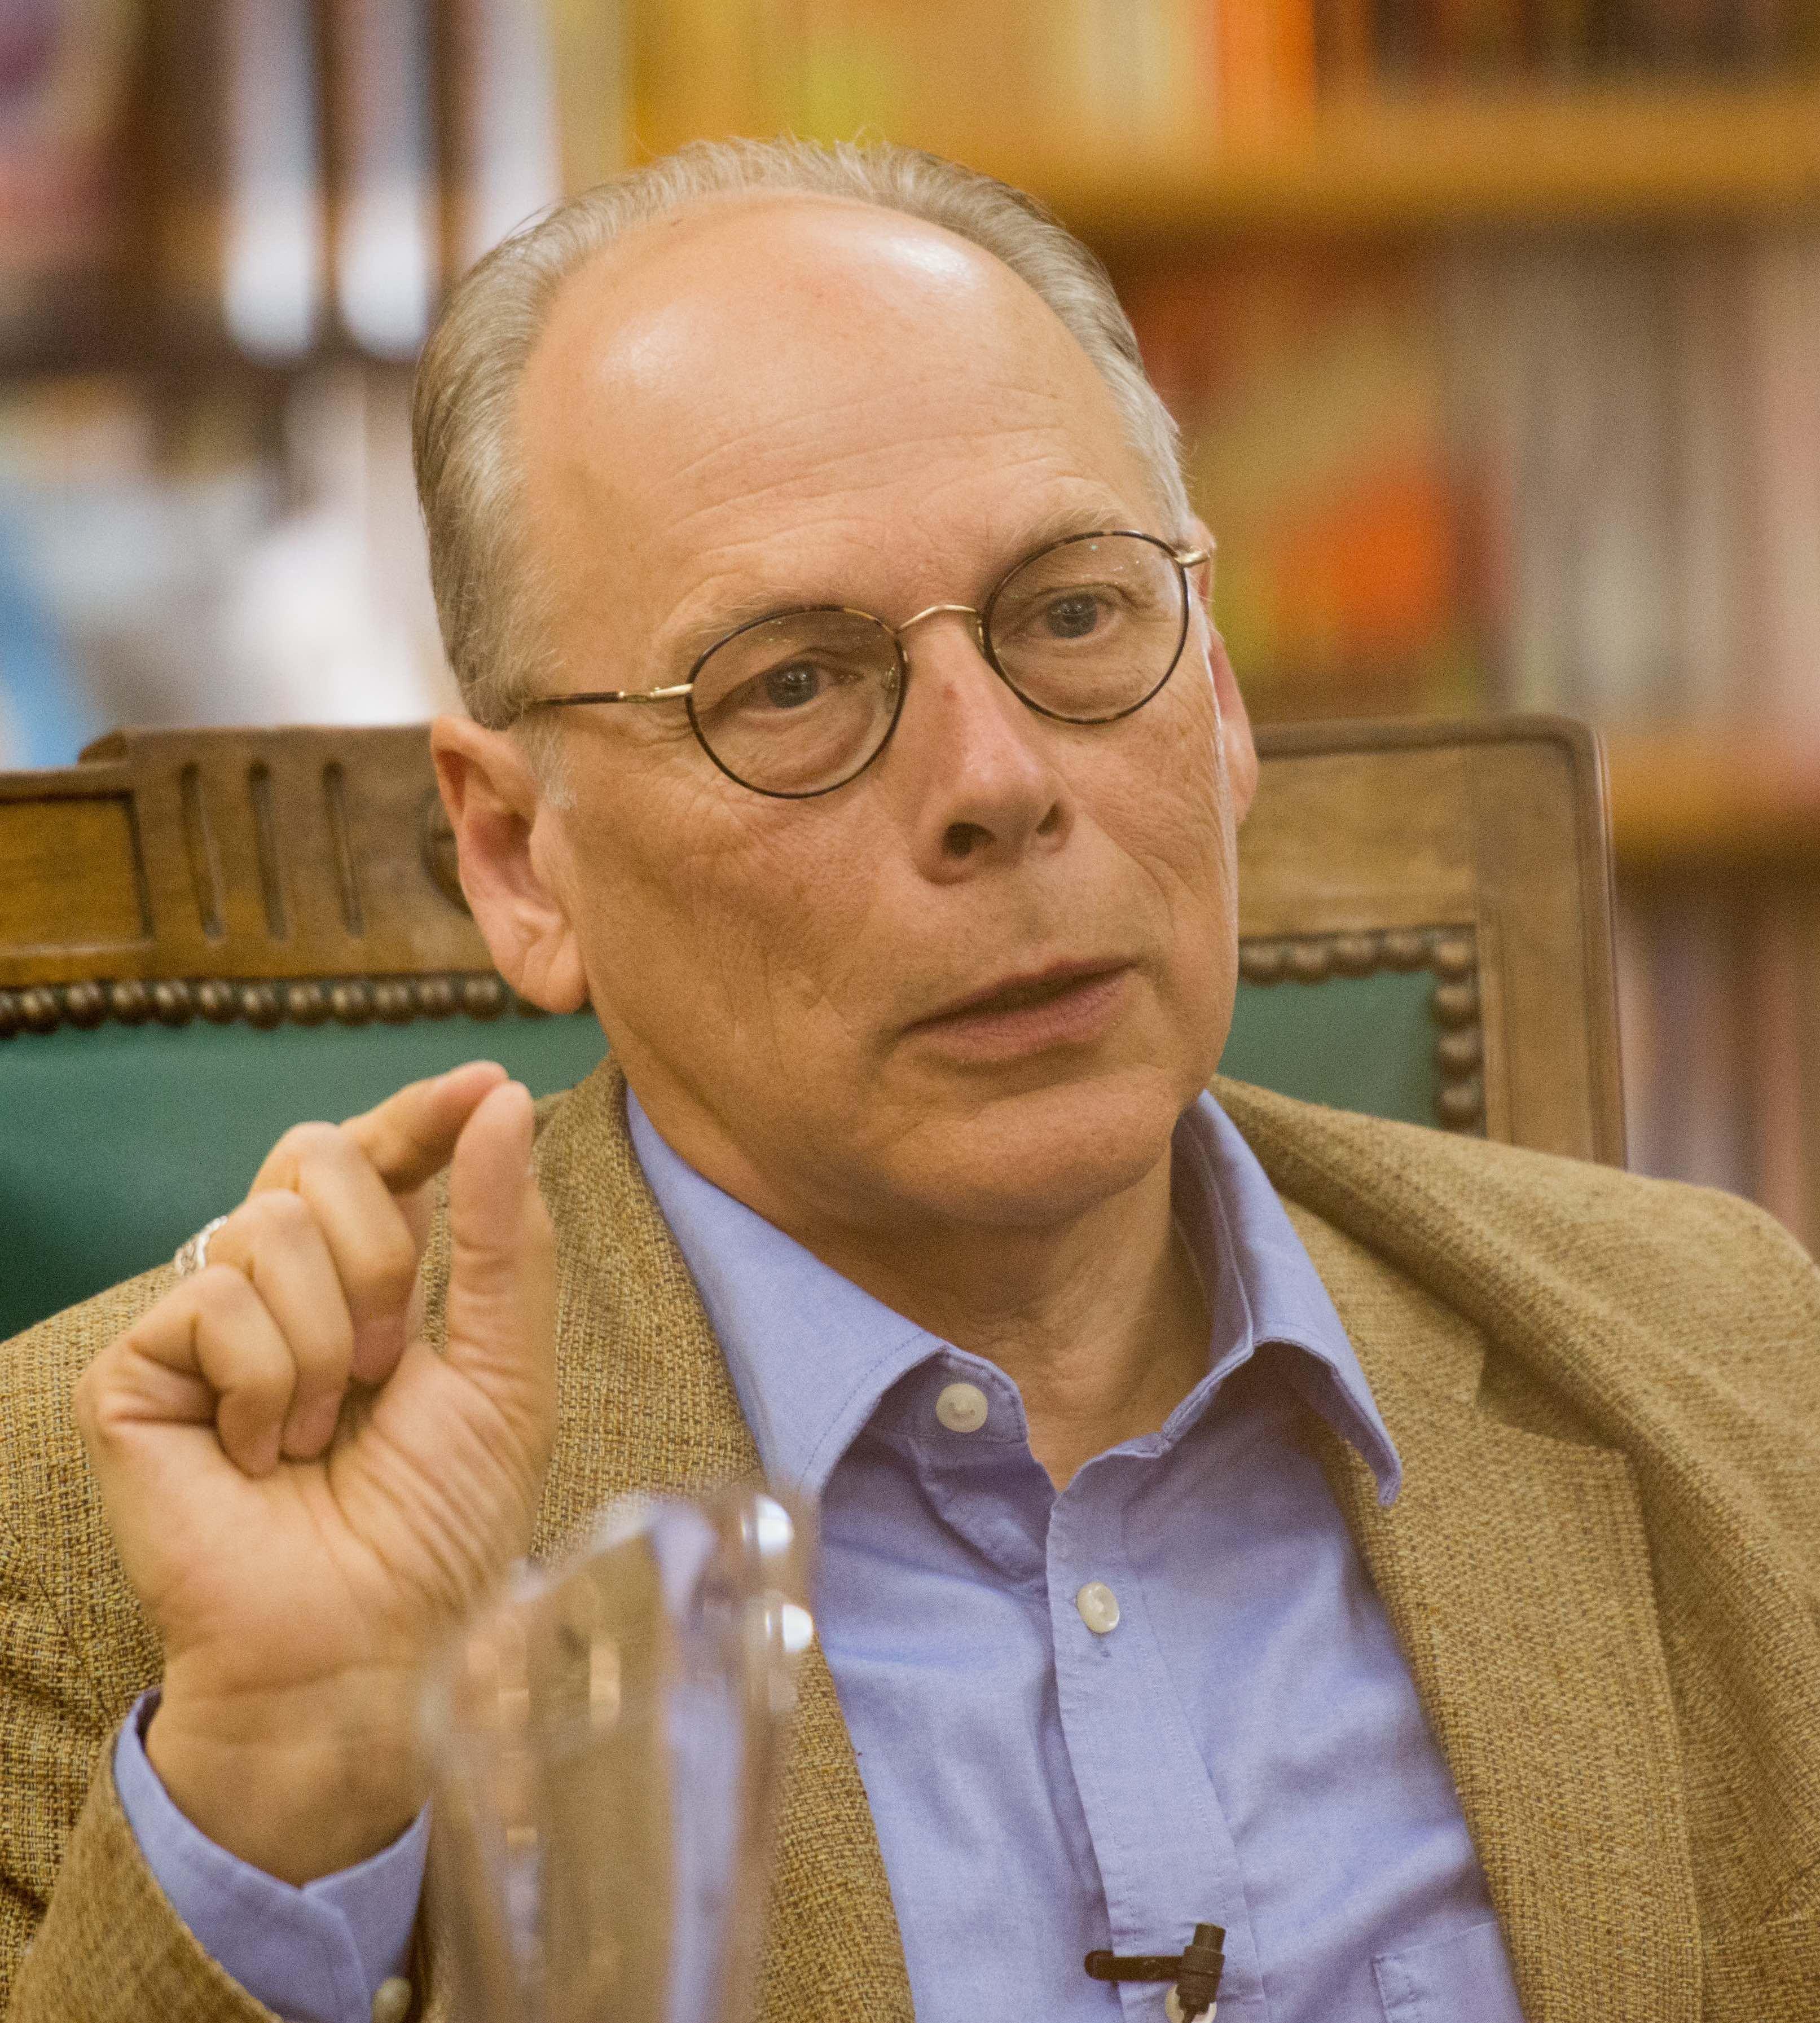 Jeffrey T. Kiehl, PhD